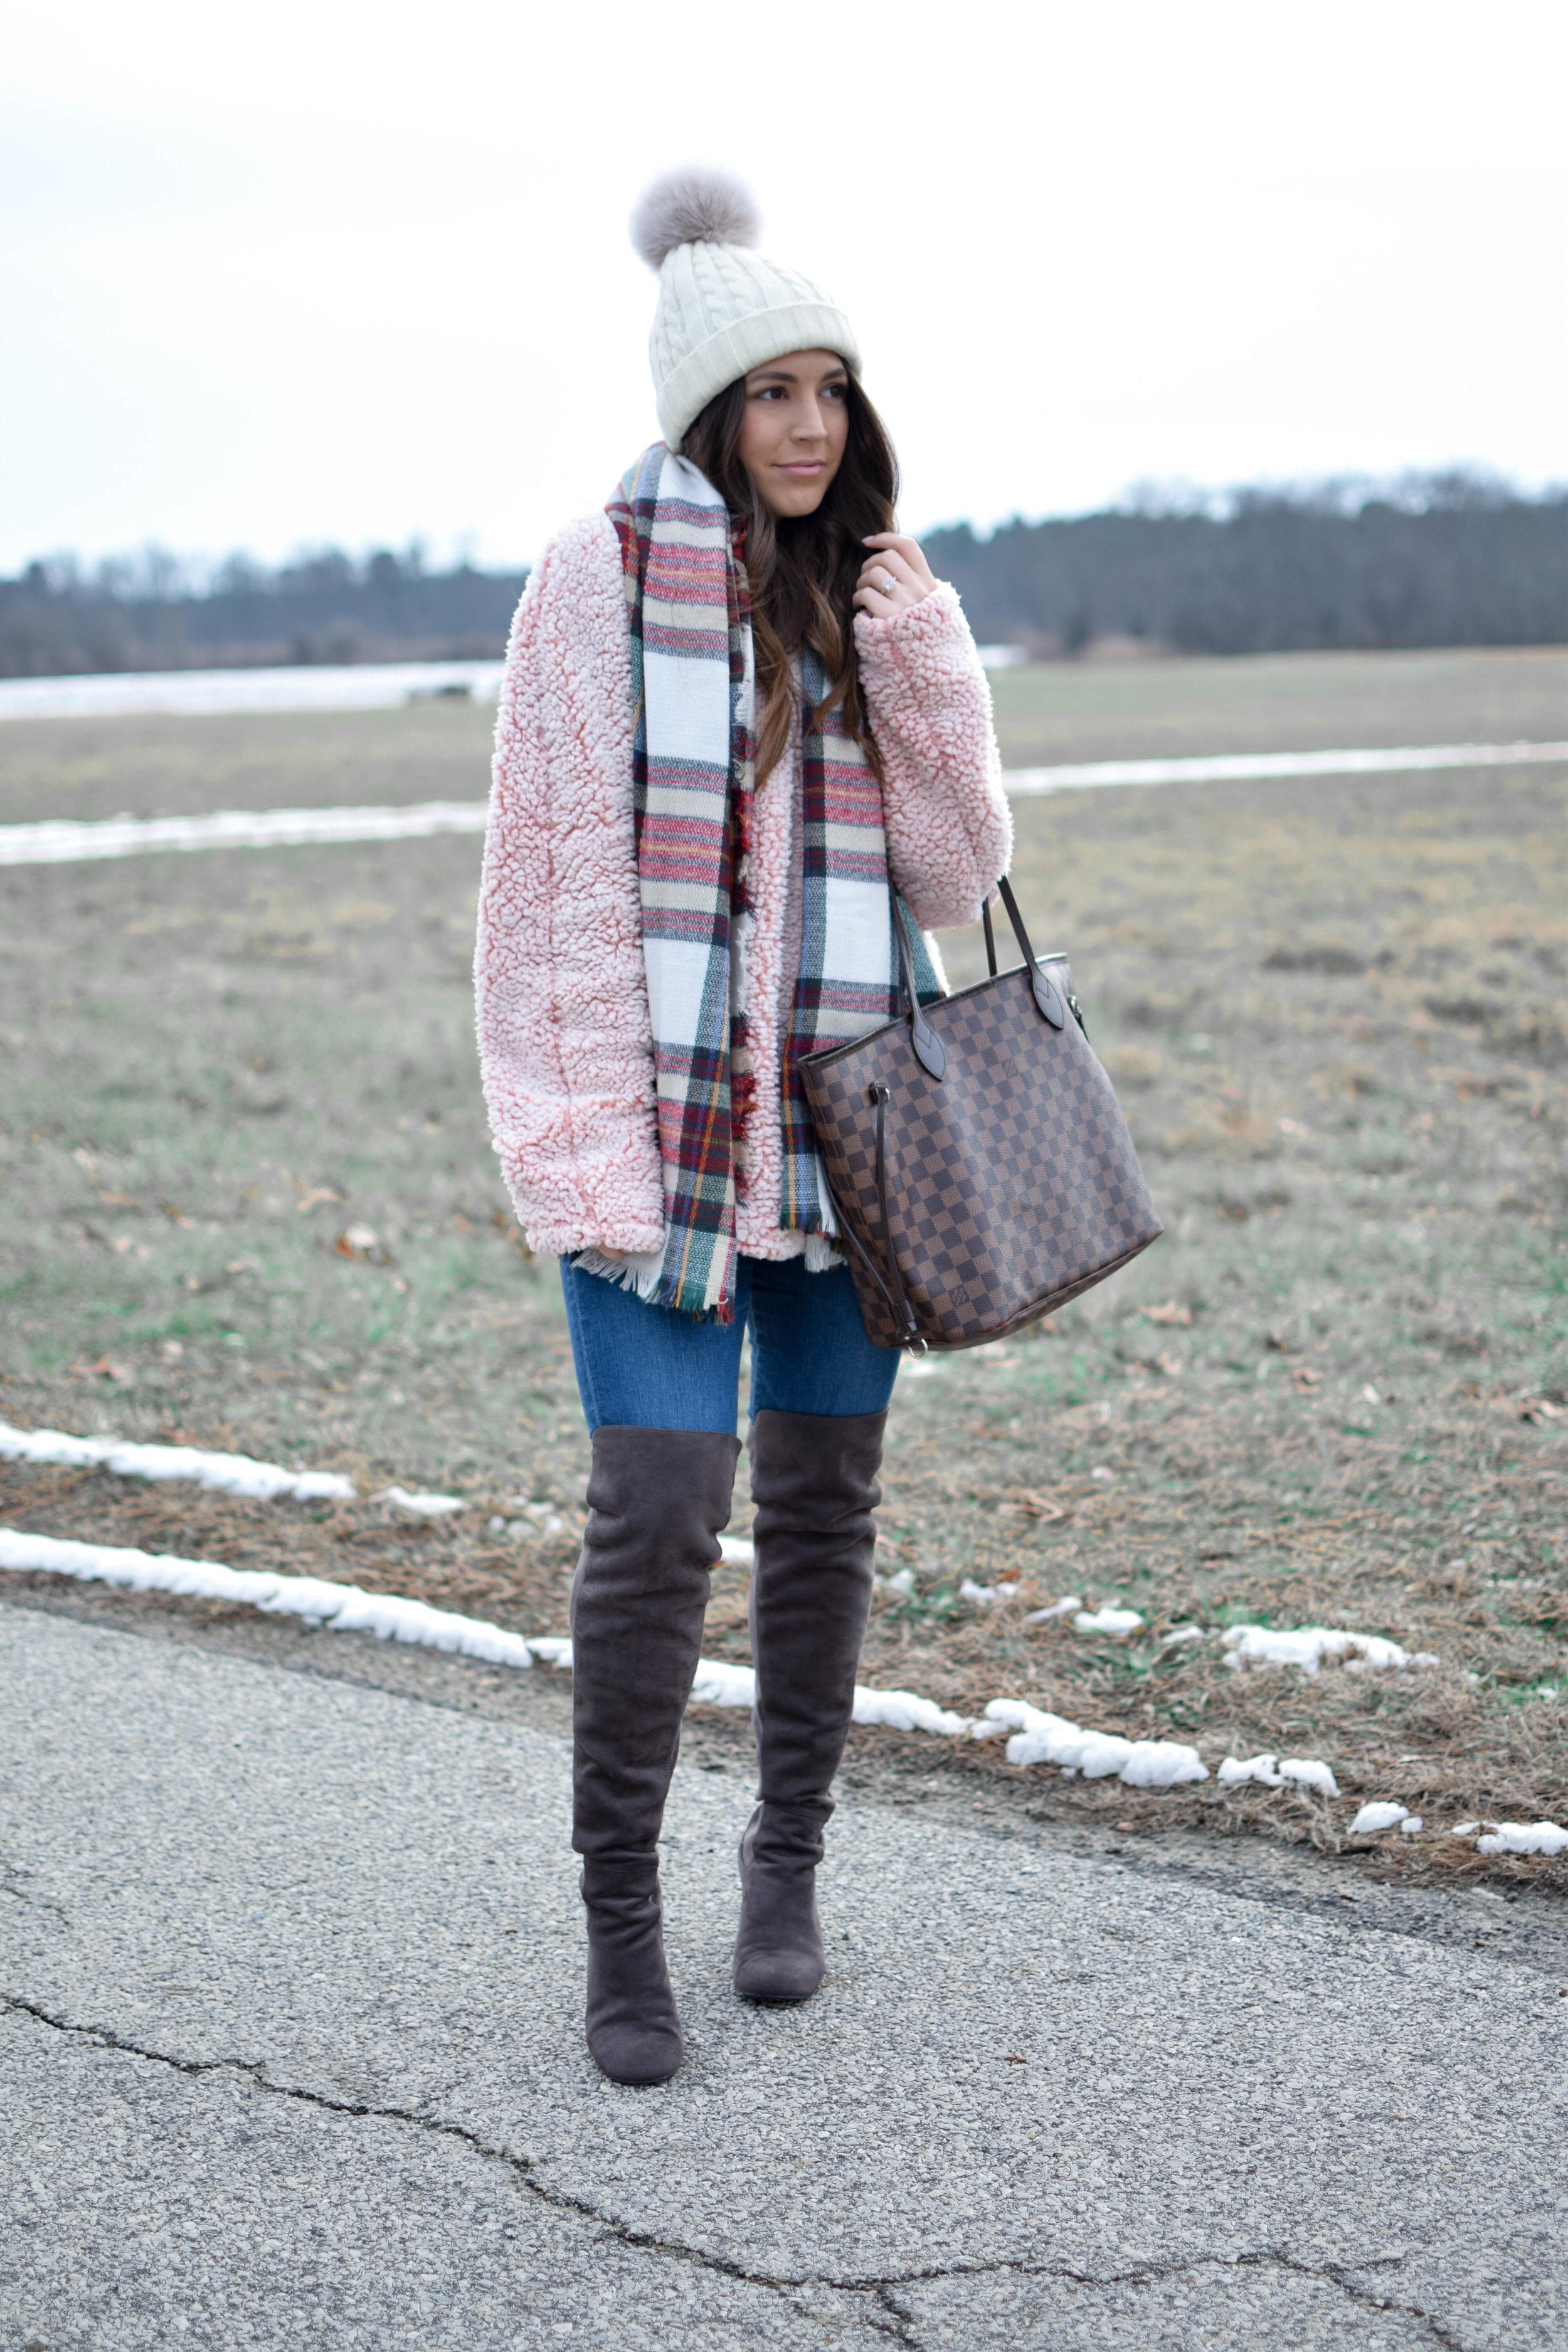 Blush Sherpa Pullover | Pine Barren Beauty | sherpa, fleece pullover, winter fashion, winter outfit idea, winter outfit inspiration, cozy outfit idea